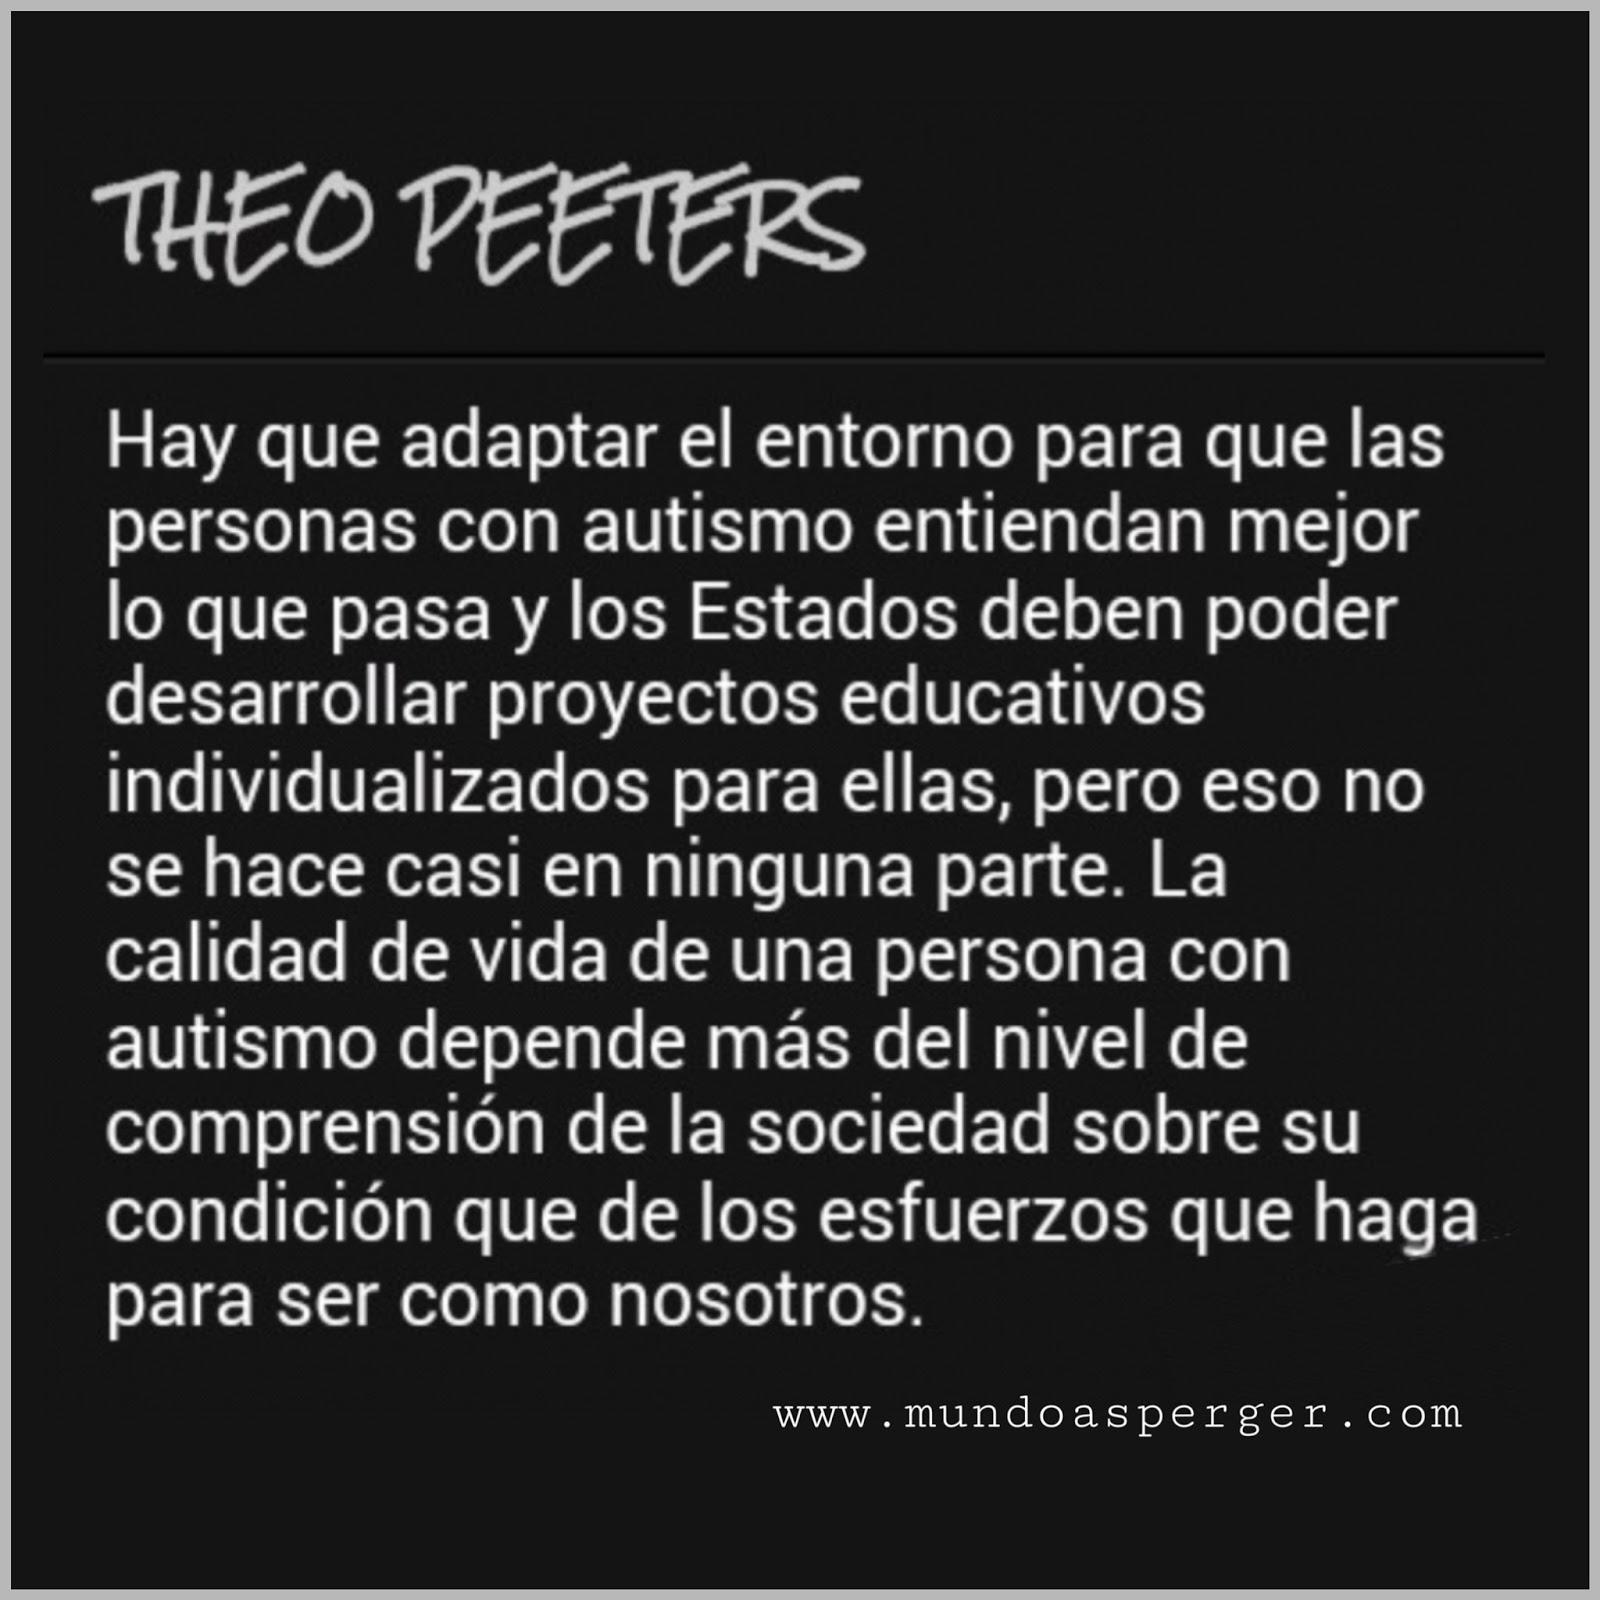 Mundo Asperger Frase Impresionante De Theo Peeters